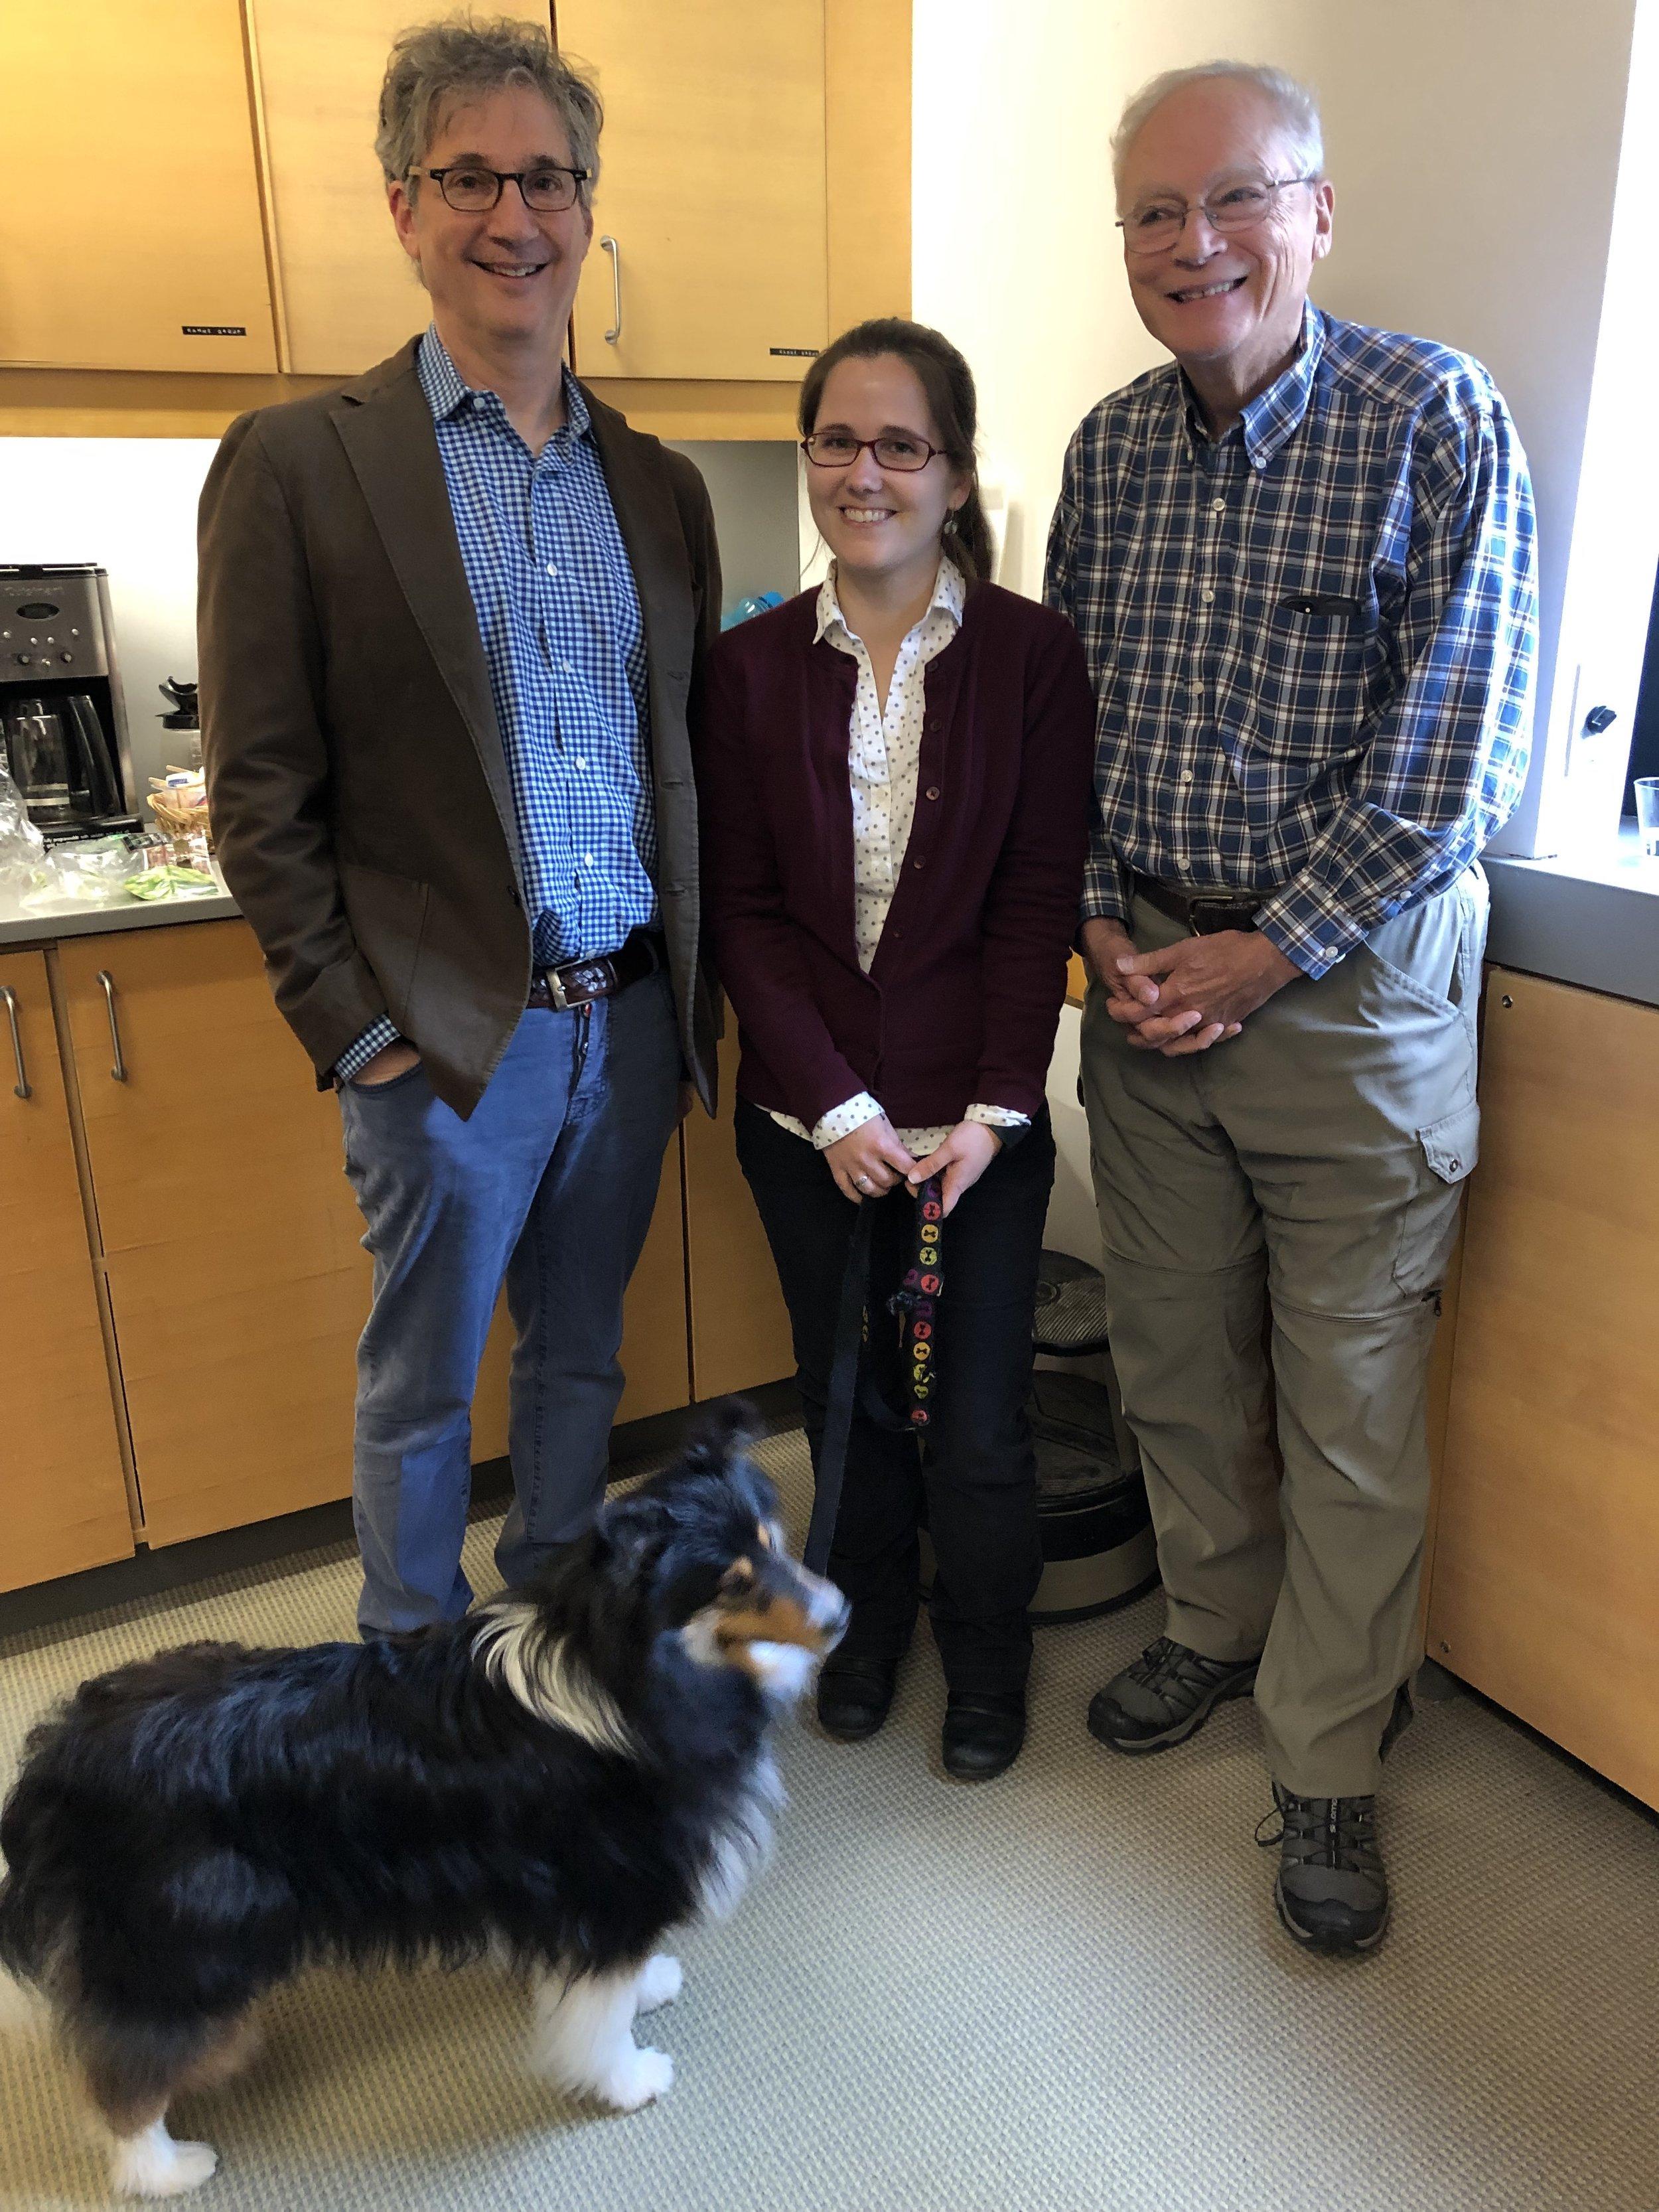 Back row: Emma Nagy with advisors Dan Kahne and Rich Losick  Front row: Nali the dog